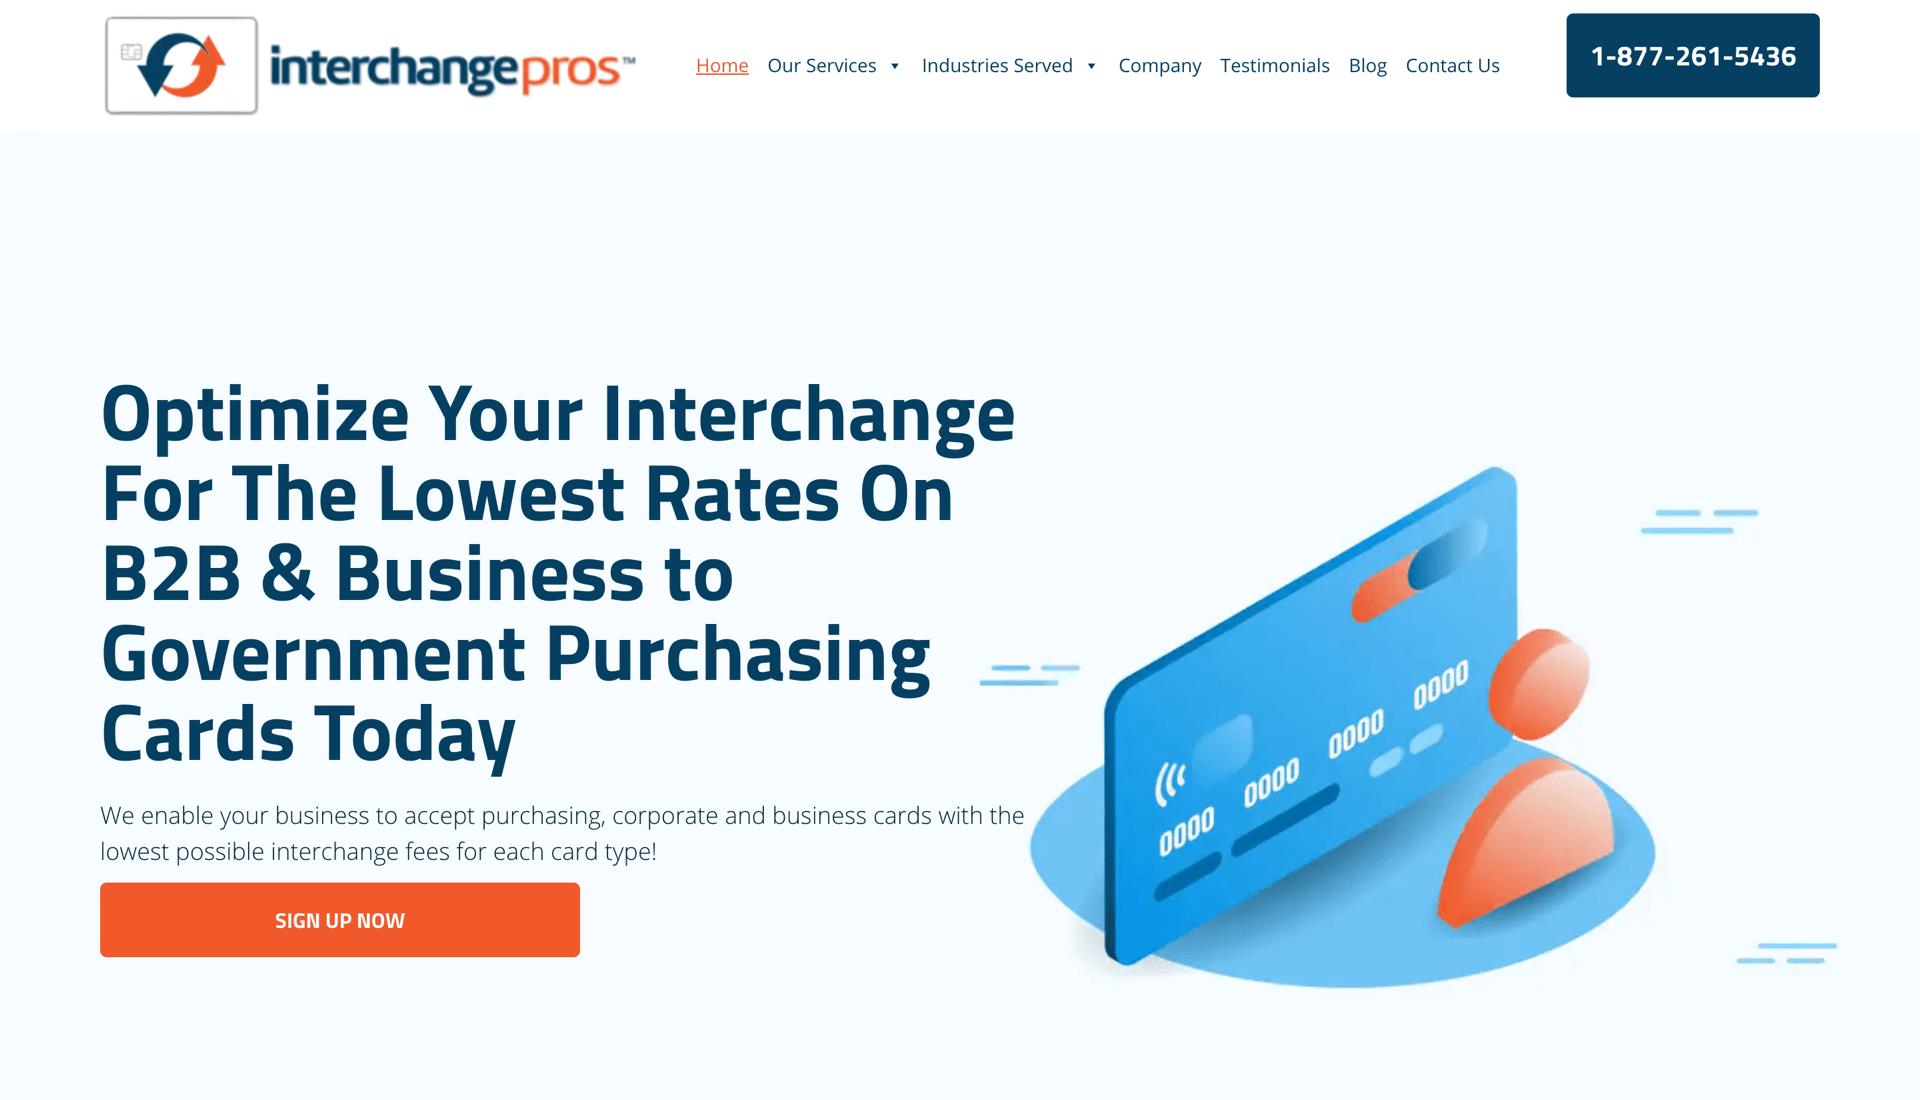 Interchange Pros